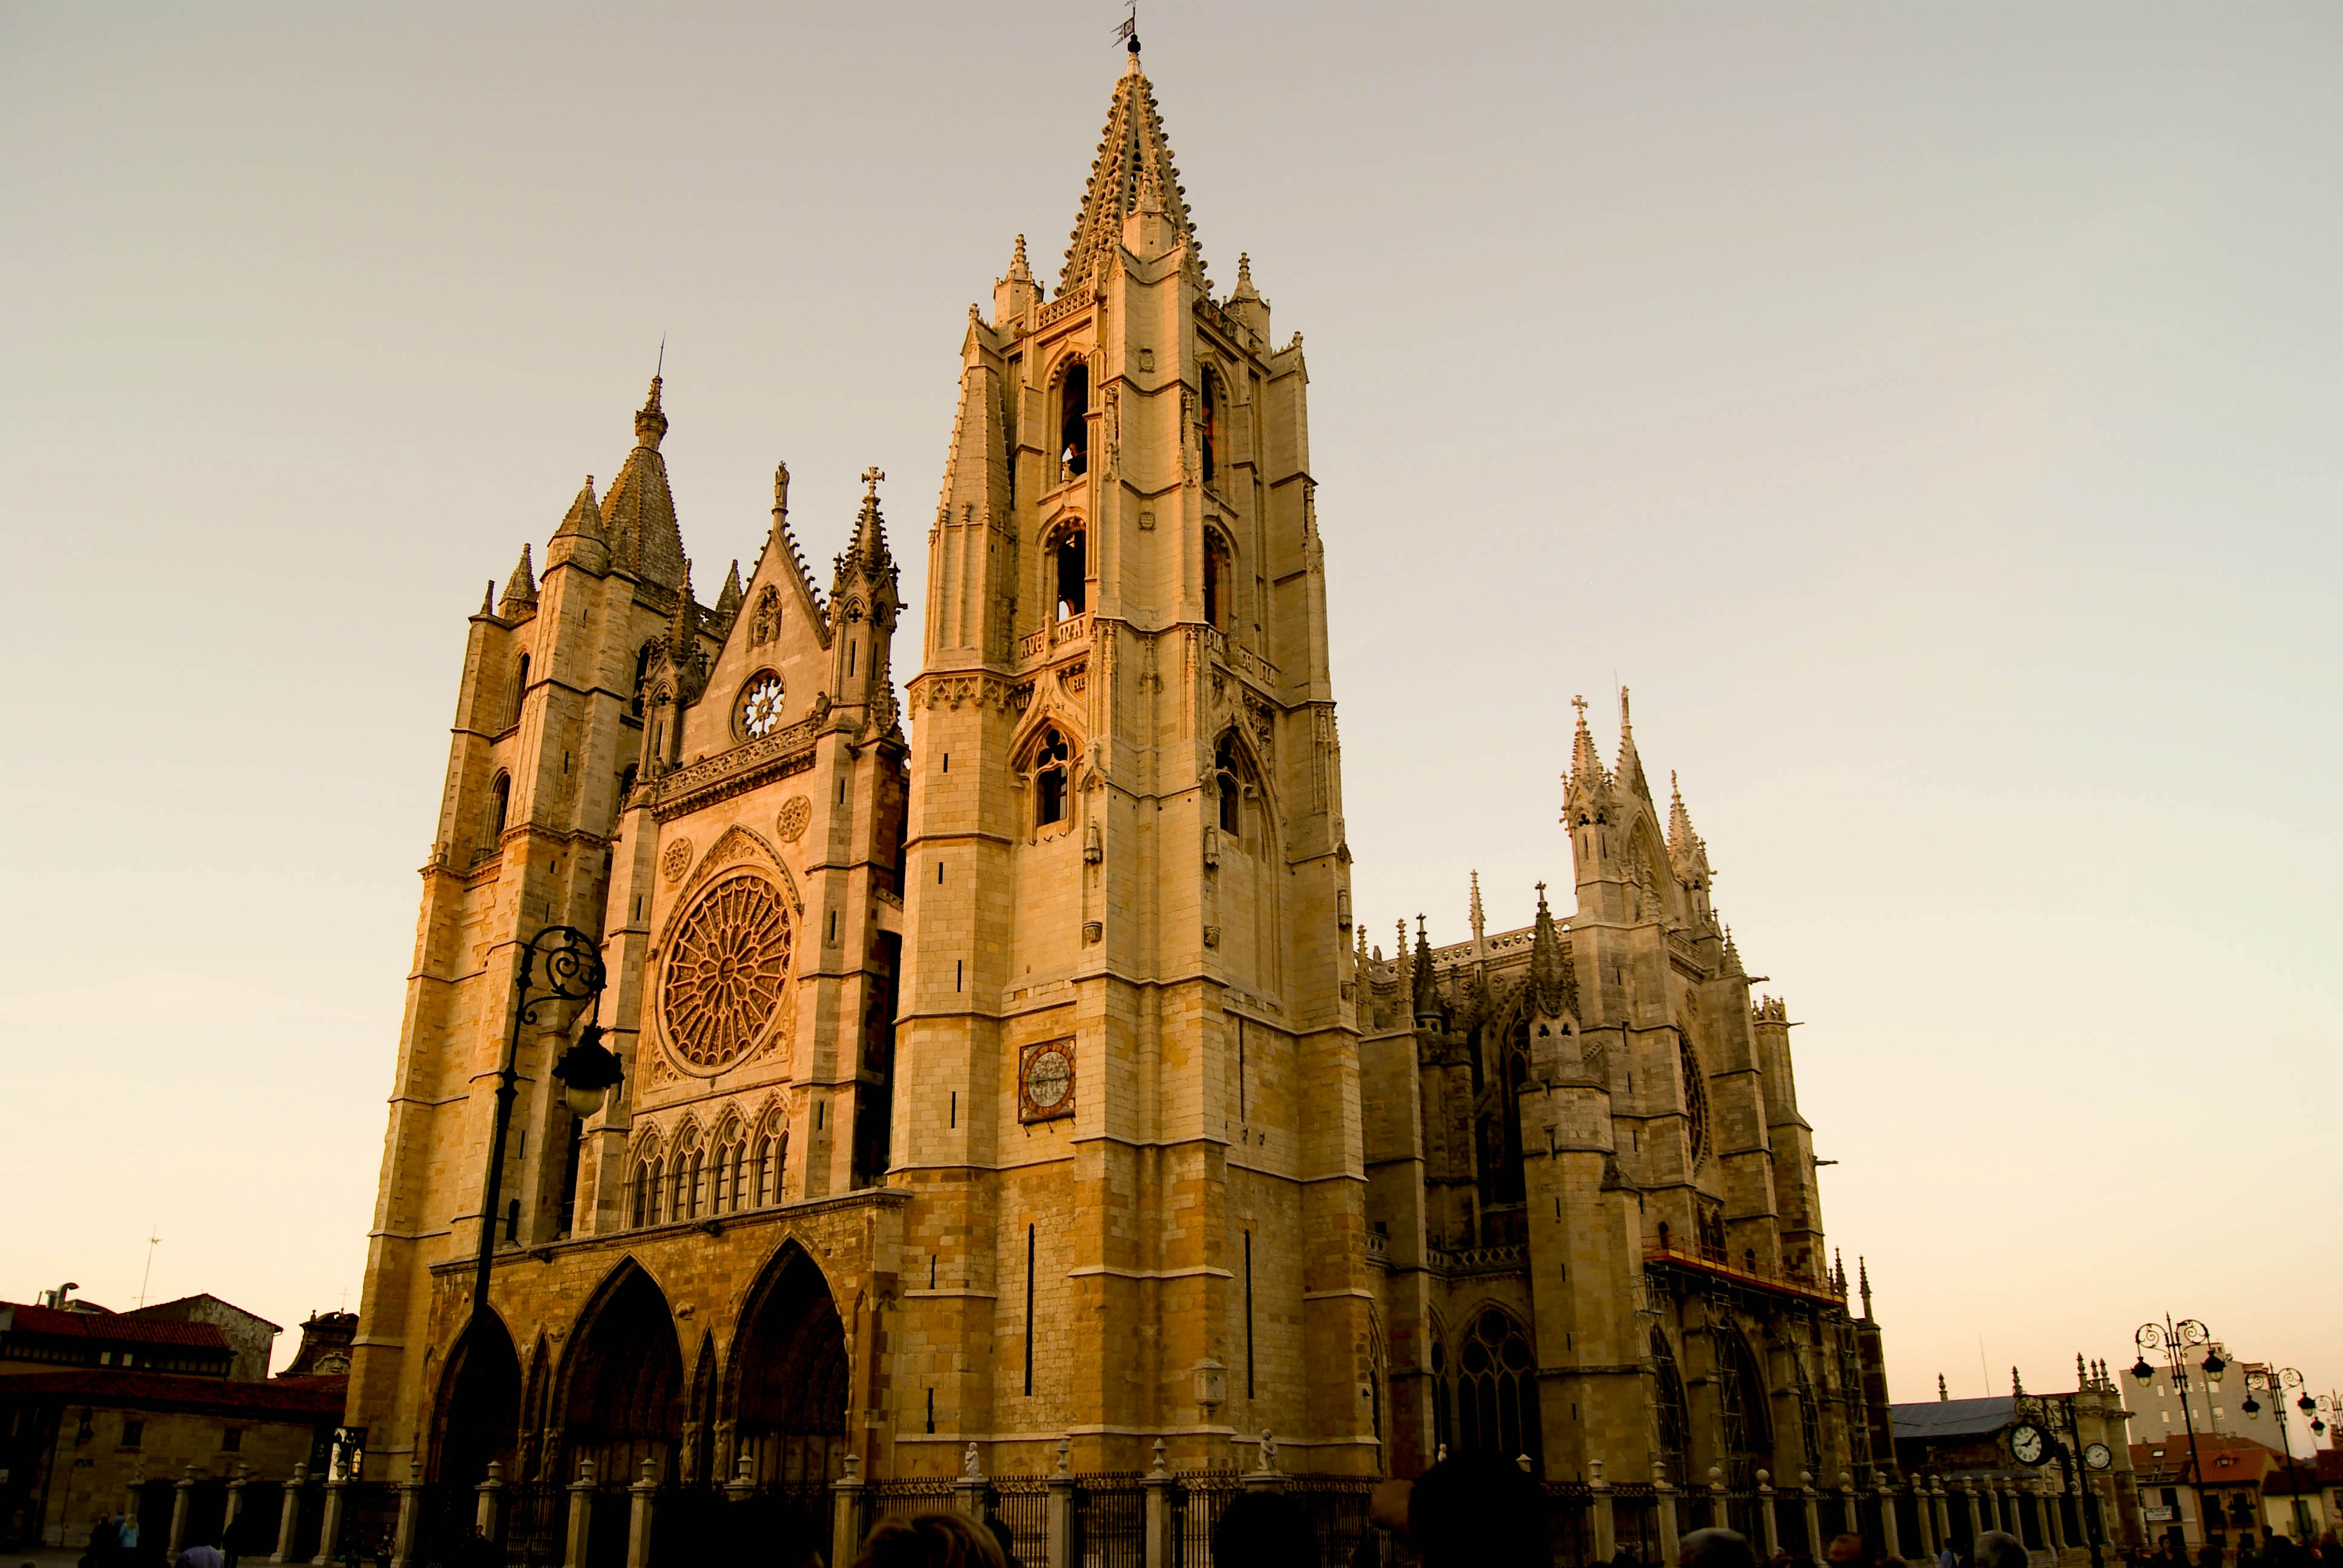 File:Catedral de leon.jpg - Wikimedia Commons